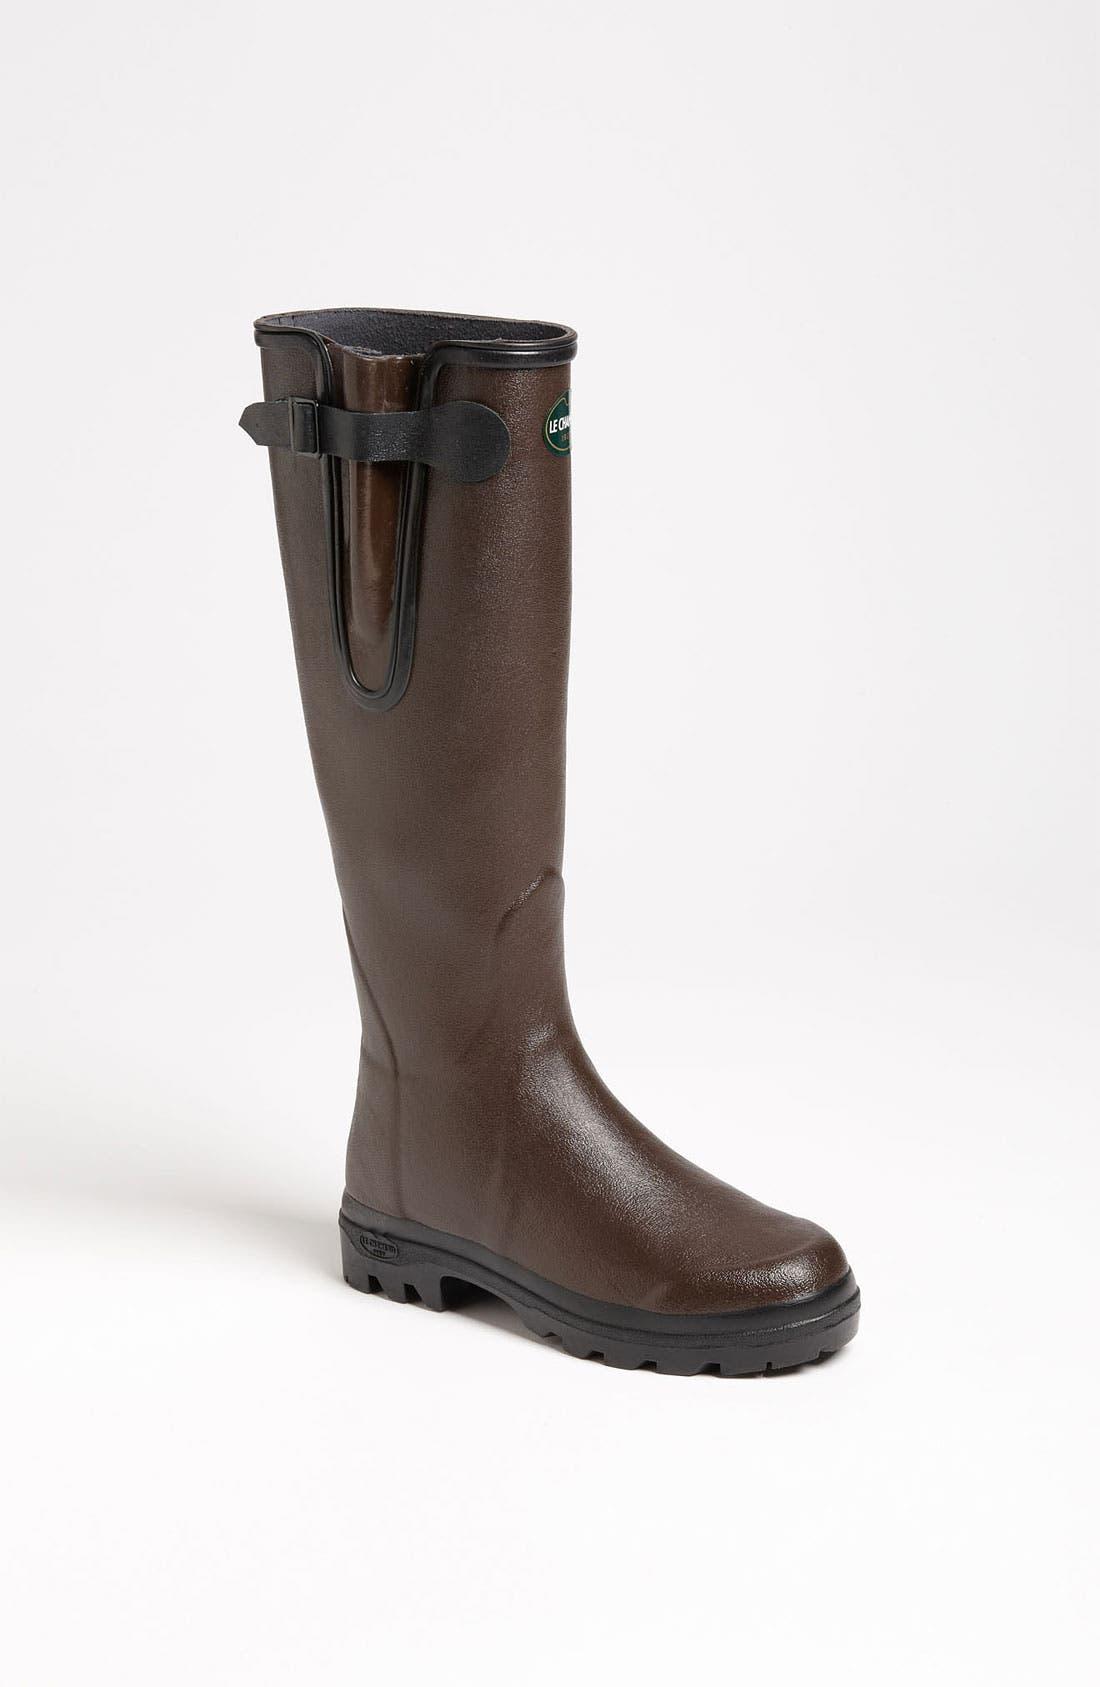 Alternate Image 1 Selected - Le Chameau 'Vierzon Lady II' Rain Boot (Women)